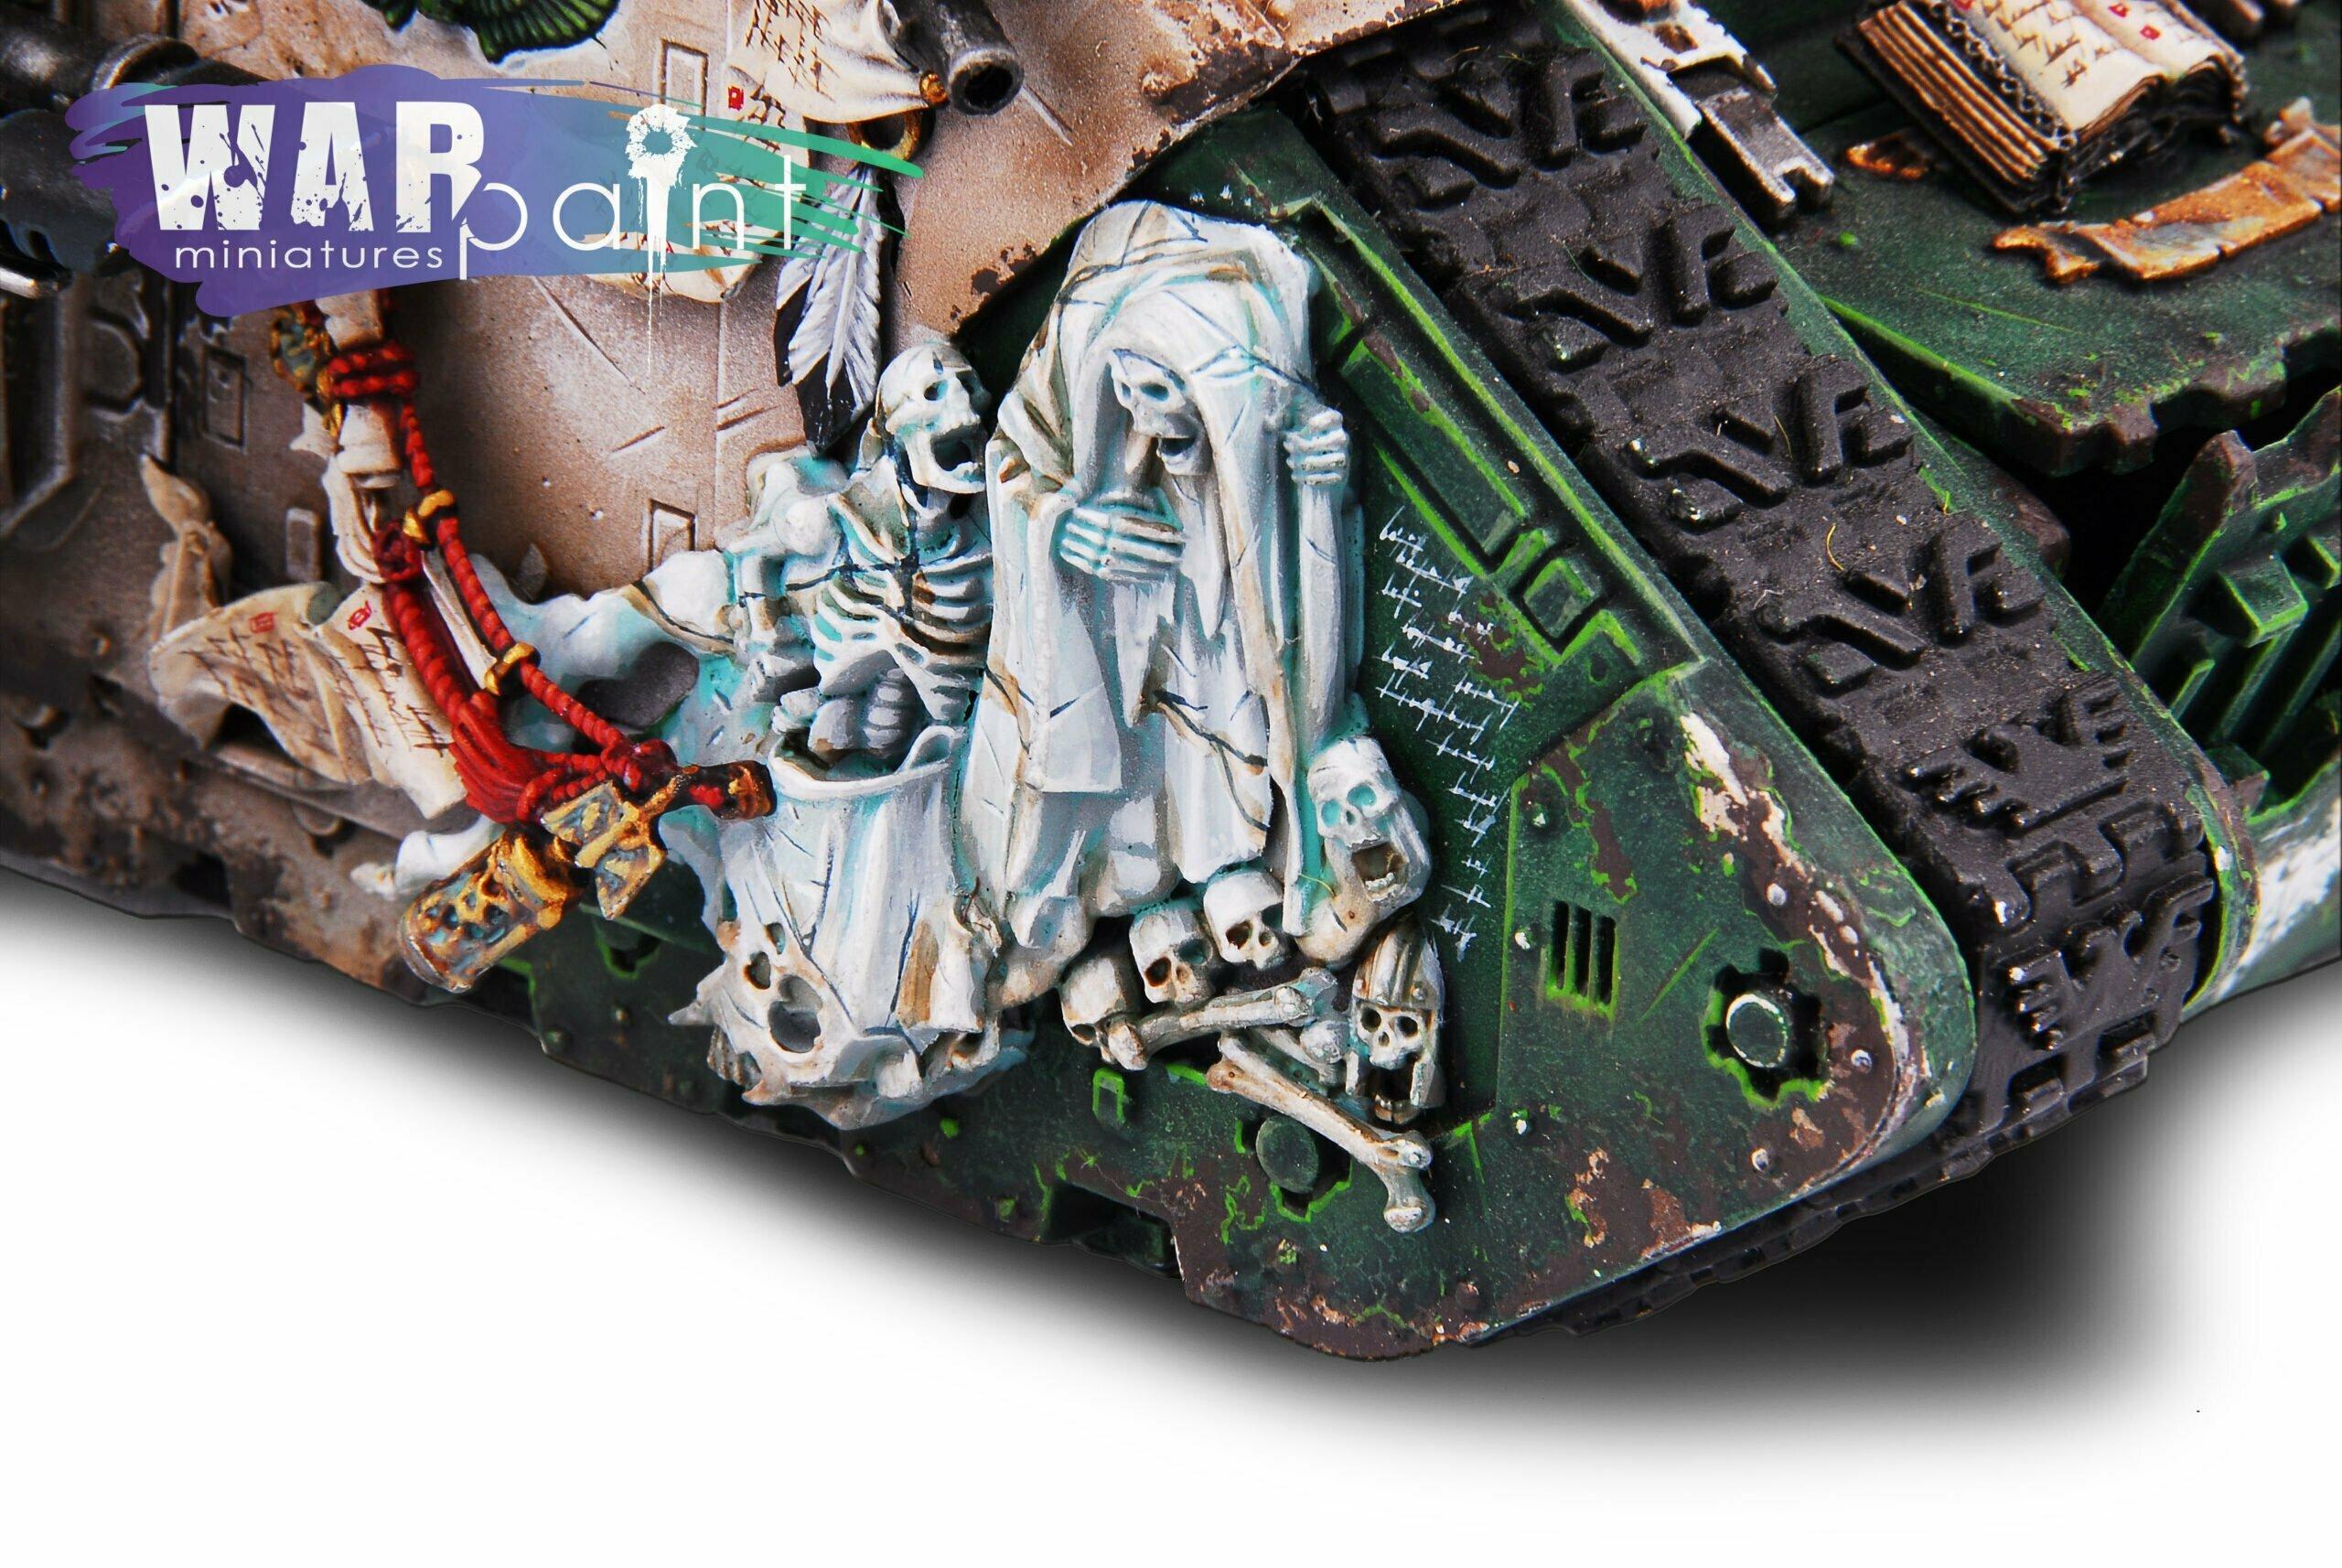 landraider-3